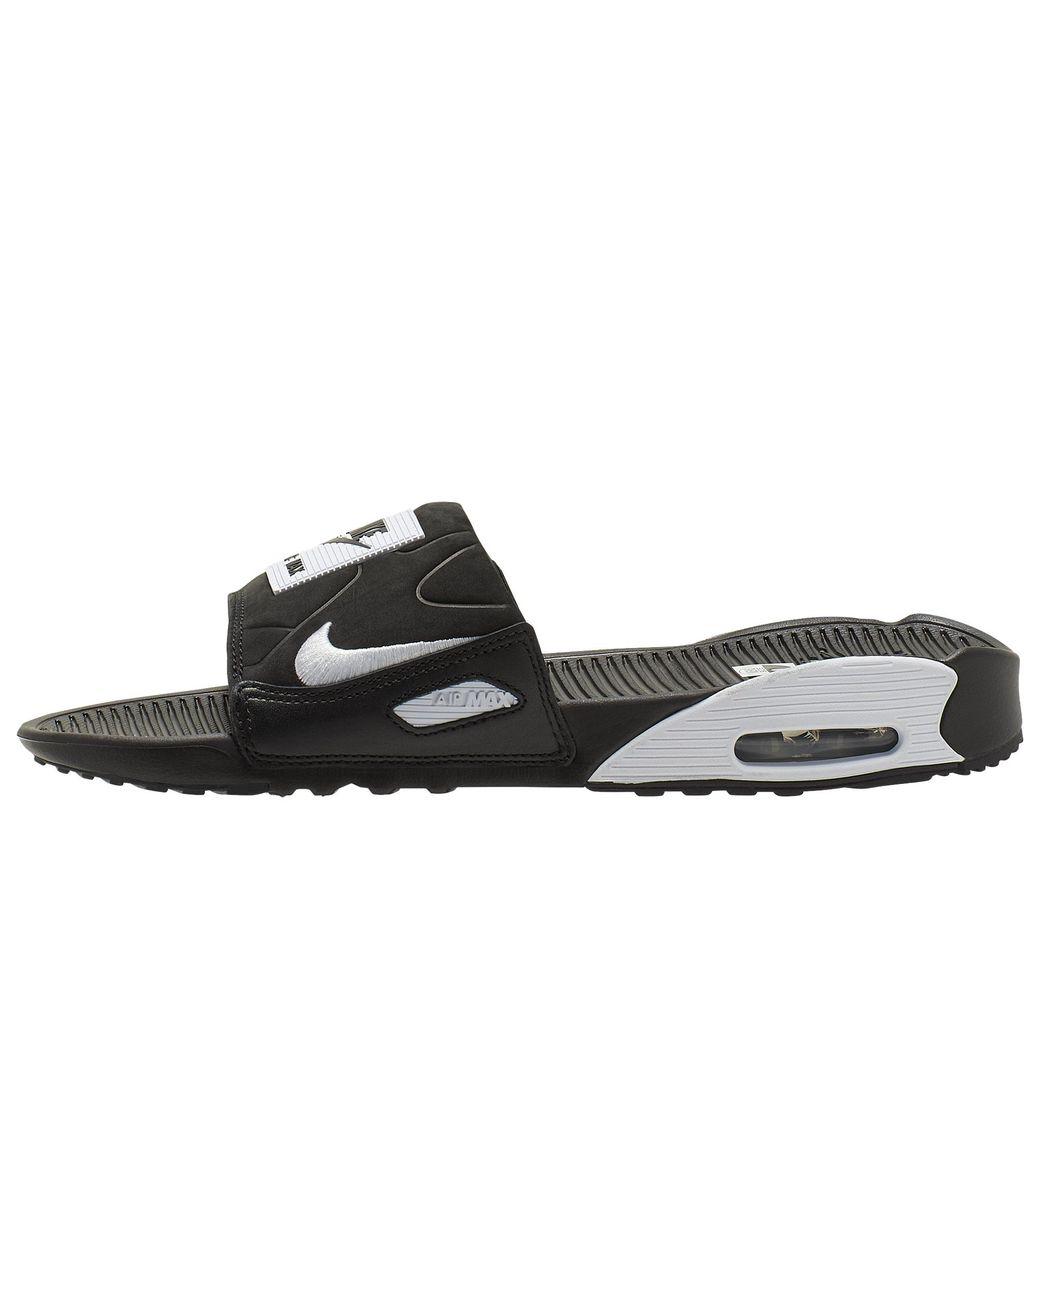 Nike Air Max 90 Slide in Black/White (Black) for Men - Save 53% - Lyst